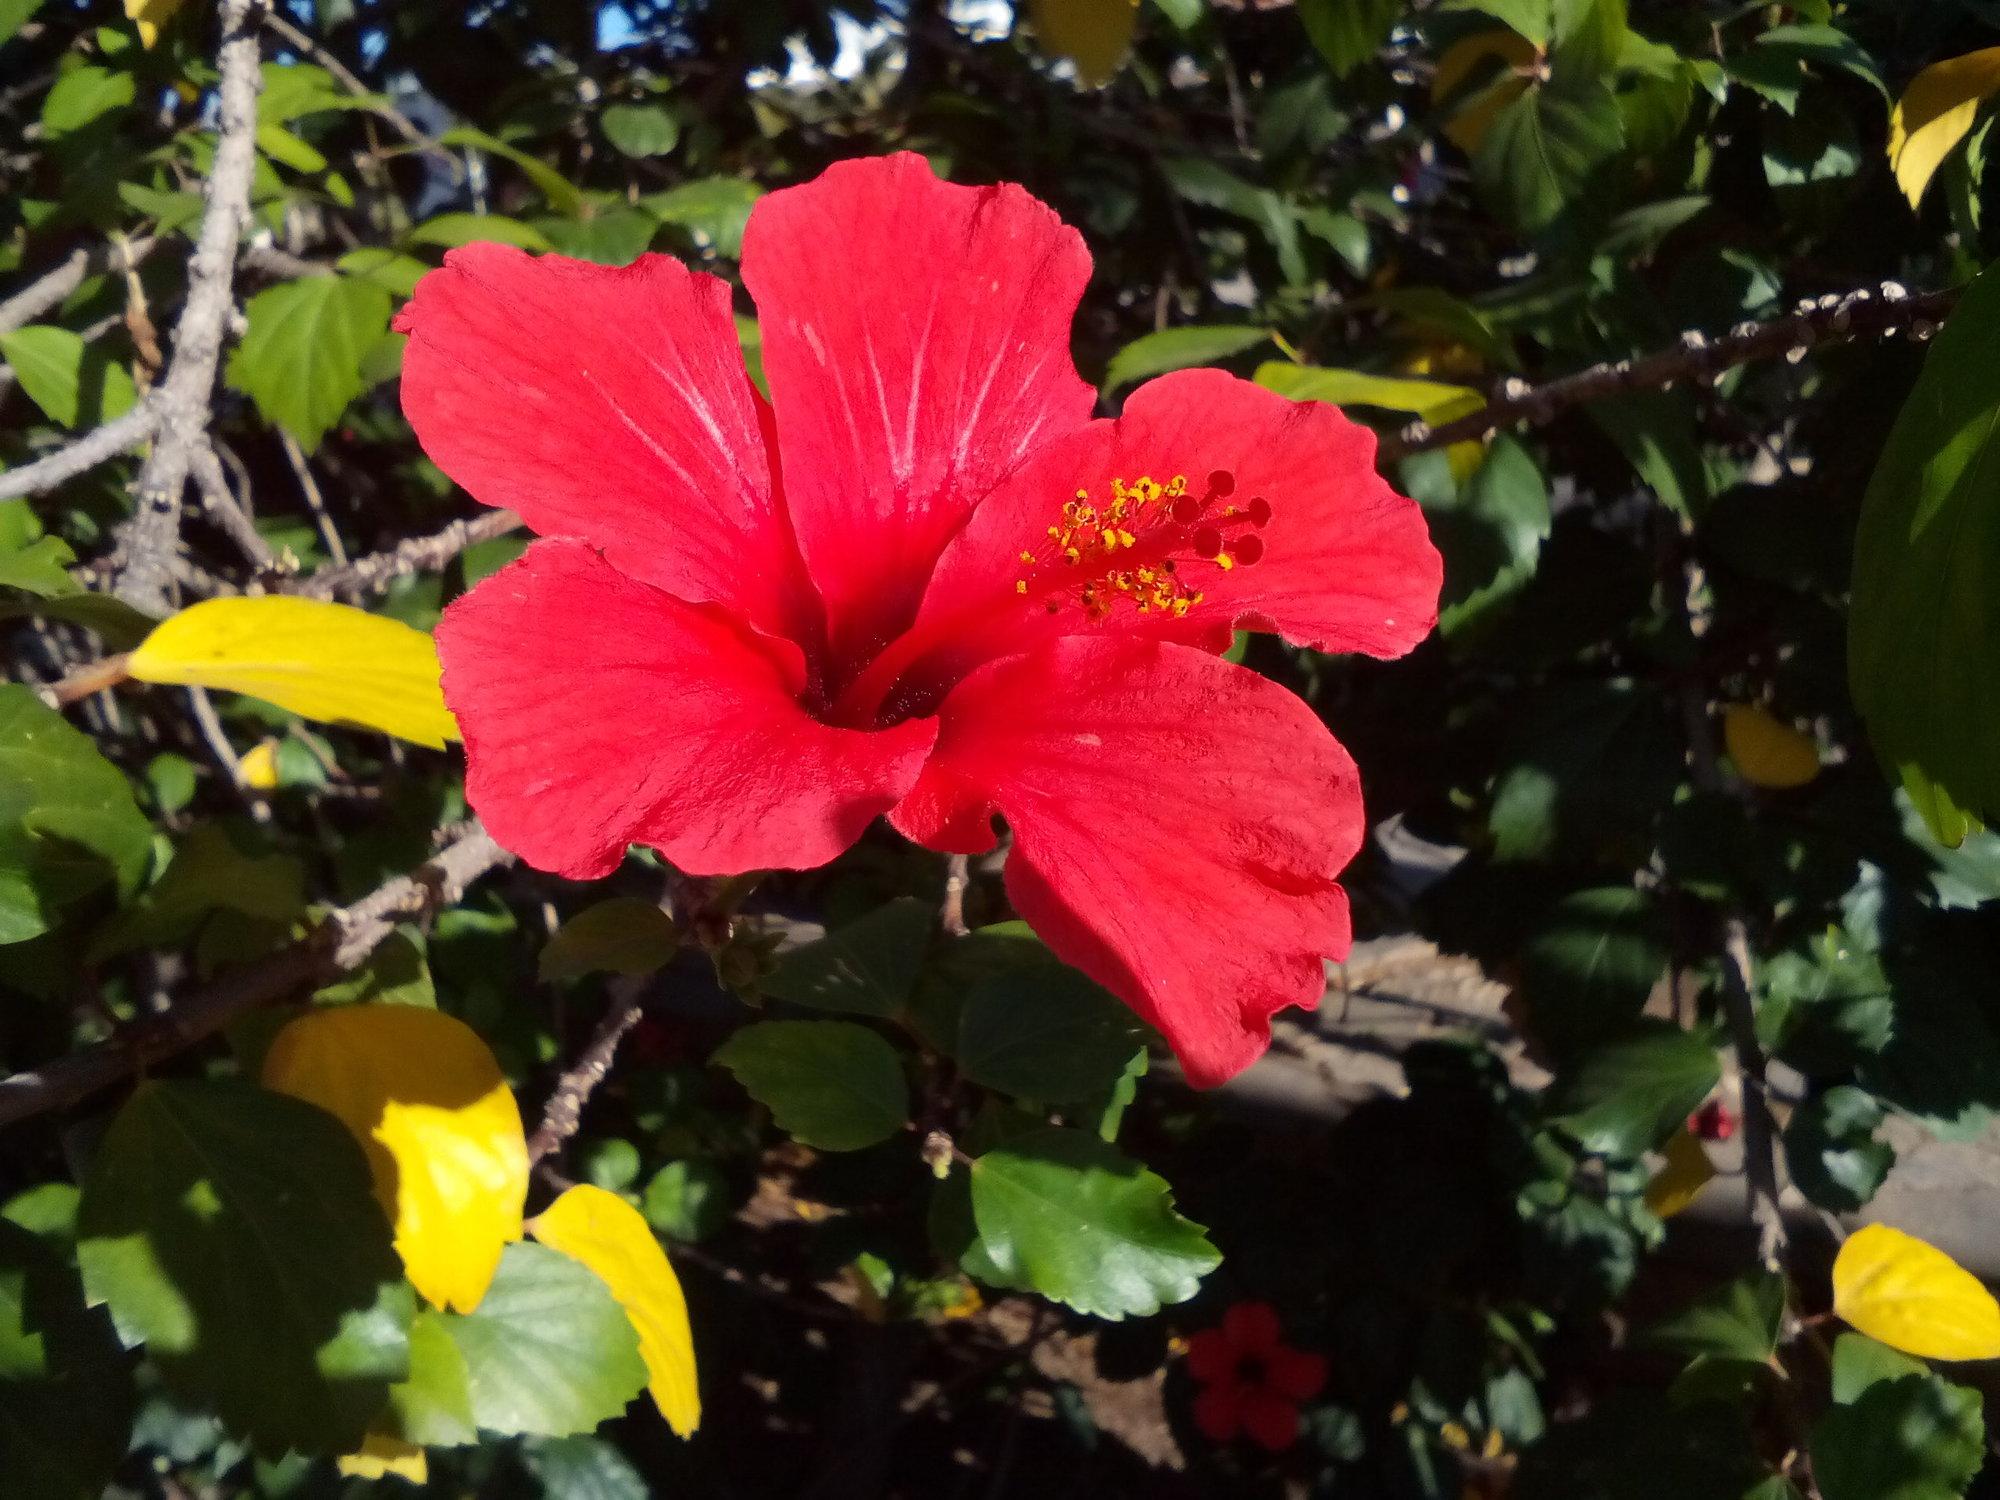 Spain malaga city which lives enfoglobe hibiscus flowers parque de mlaga hibiscus flowers parque de mlaga izmirmasajfo